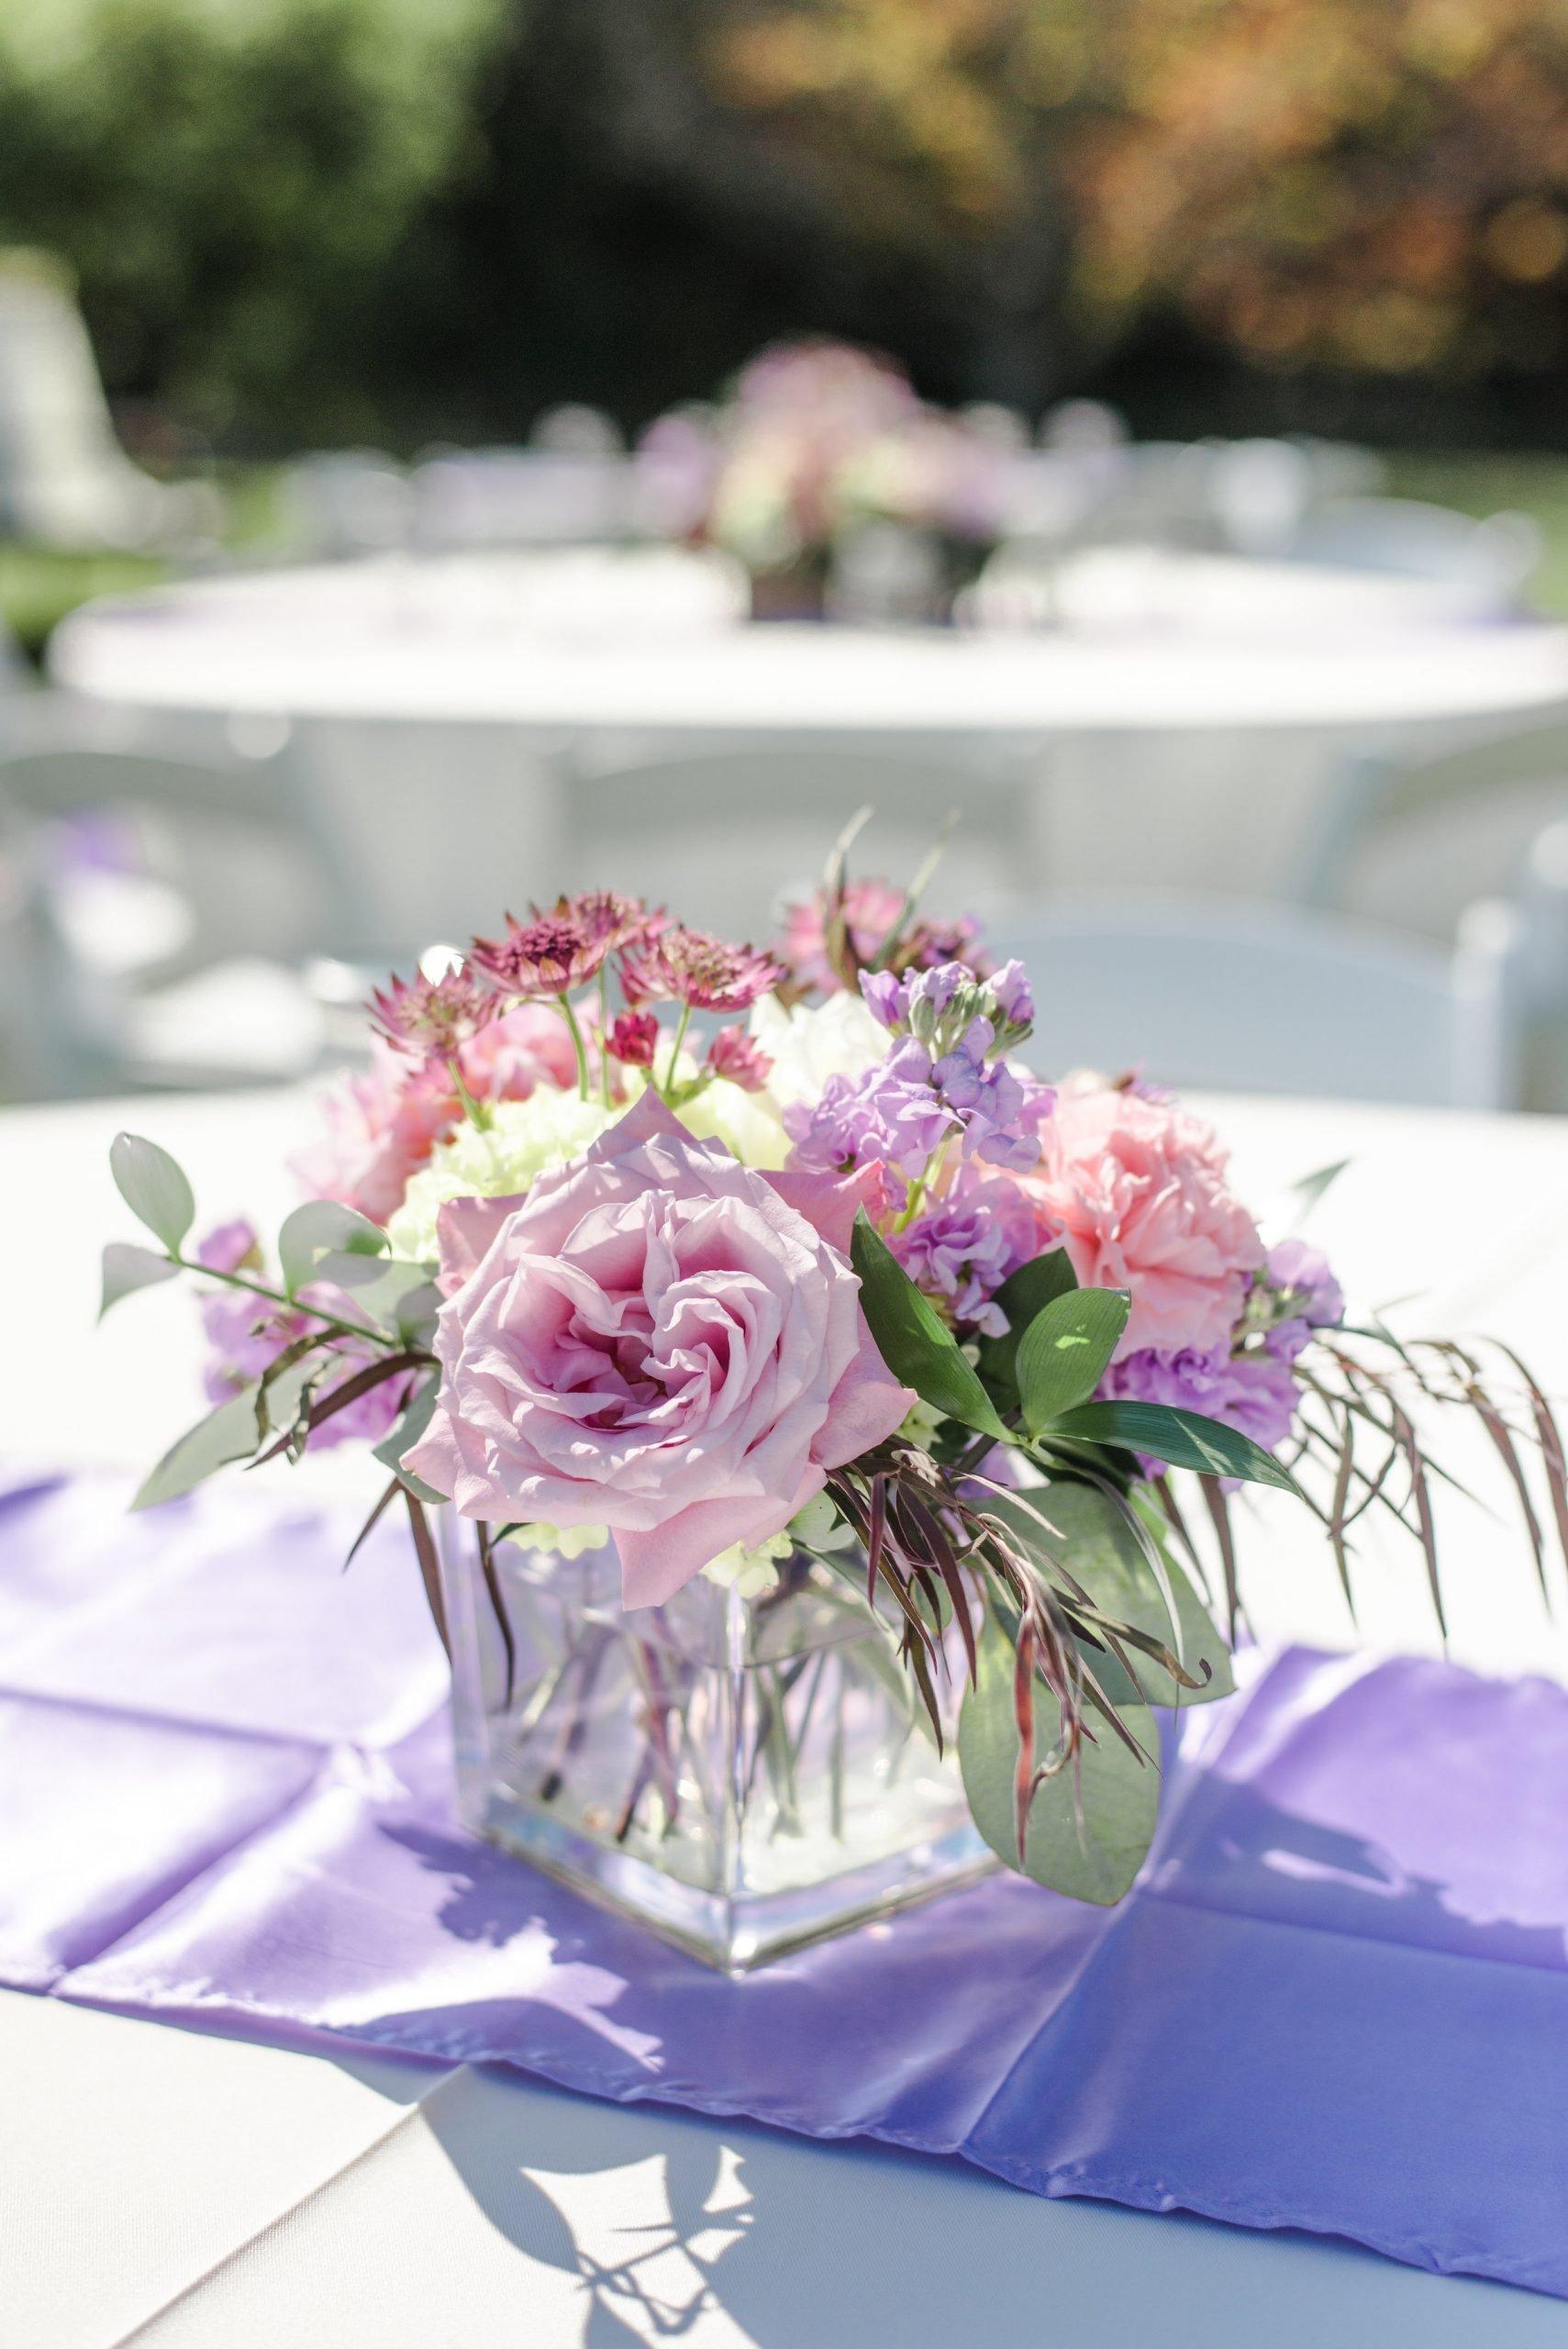 Cube vase arrangement, garden rose centerpiece